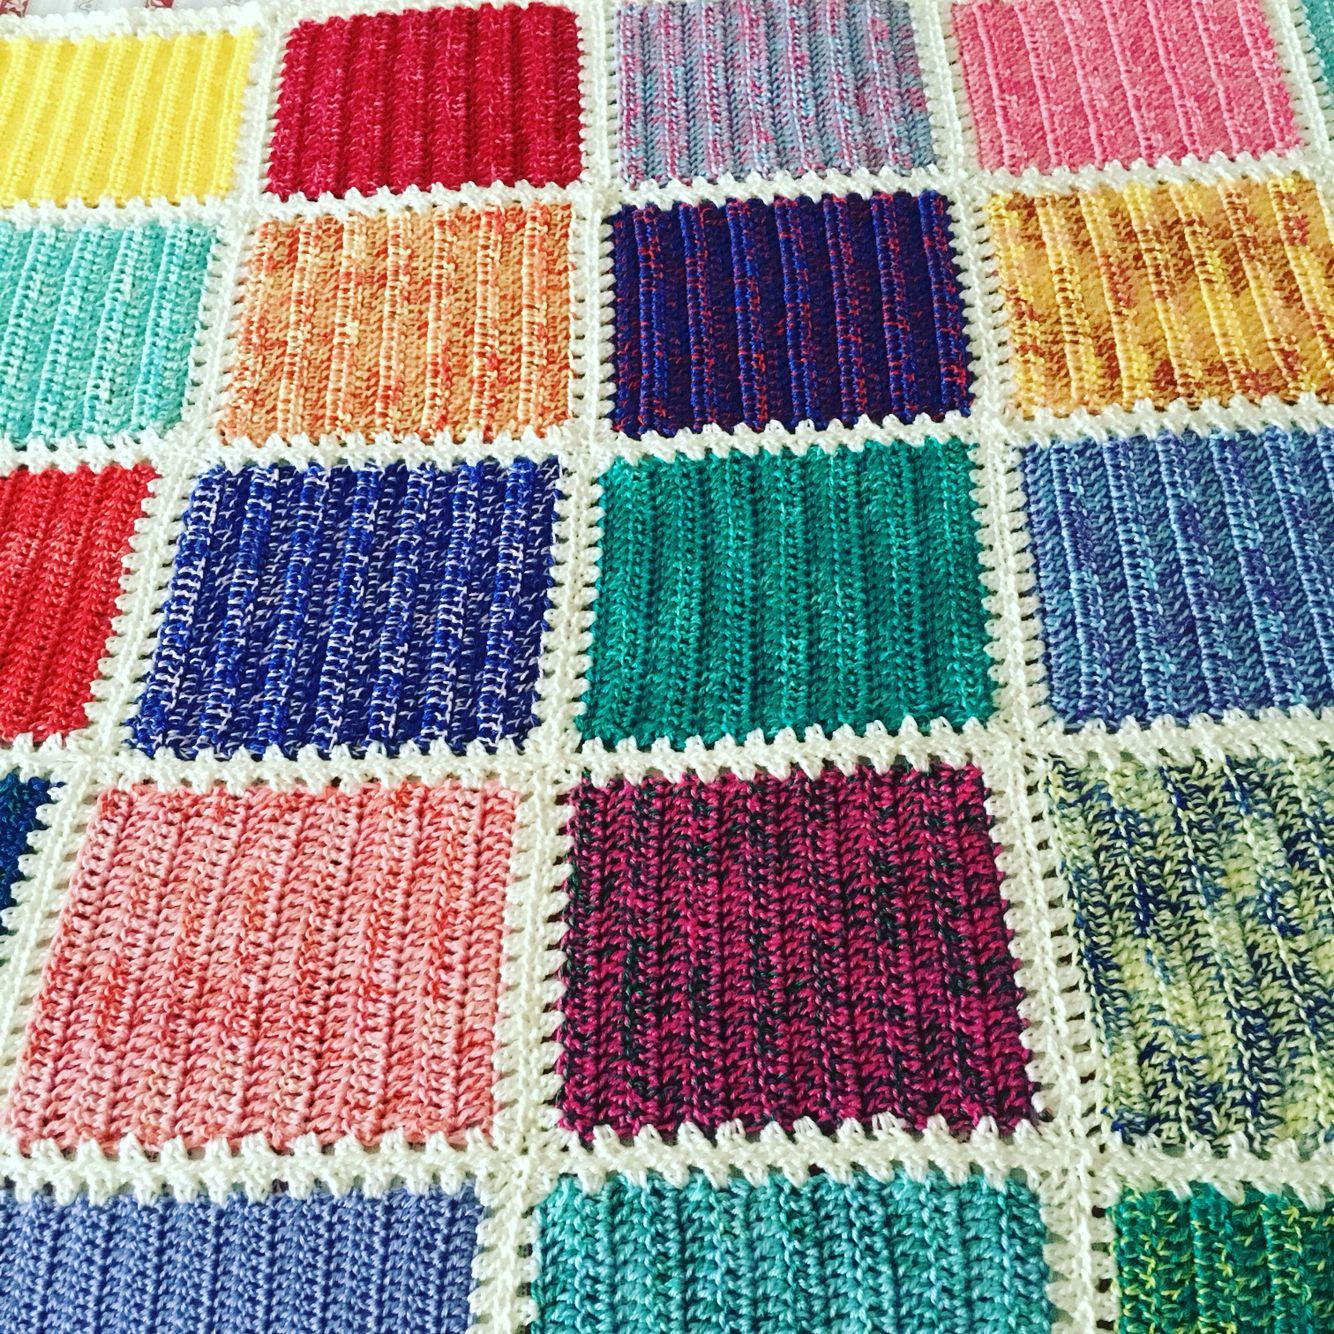 Mi nueva distracción!!! #crochet #crochetaddict #llovecrochet